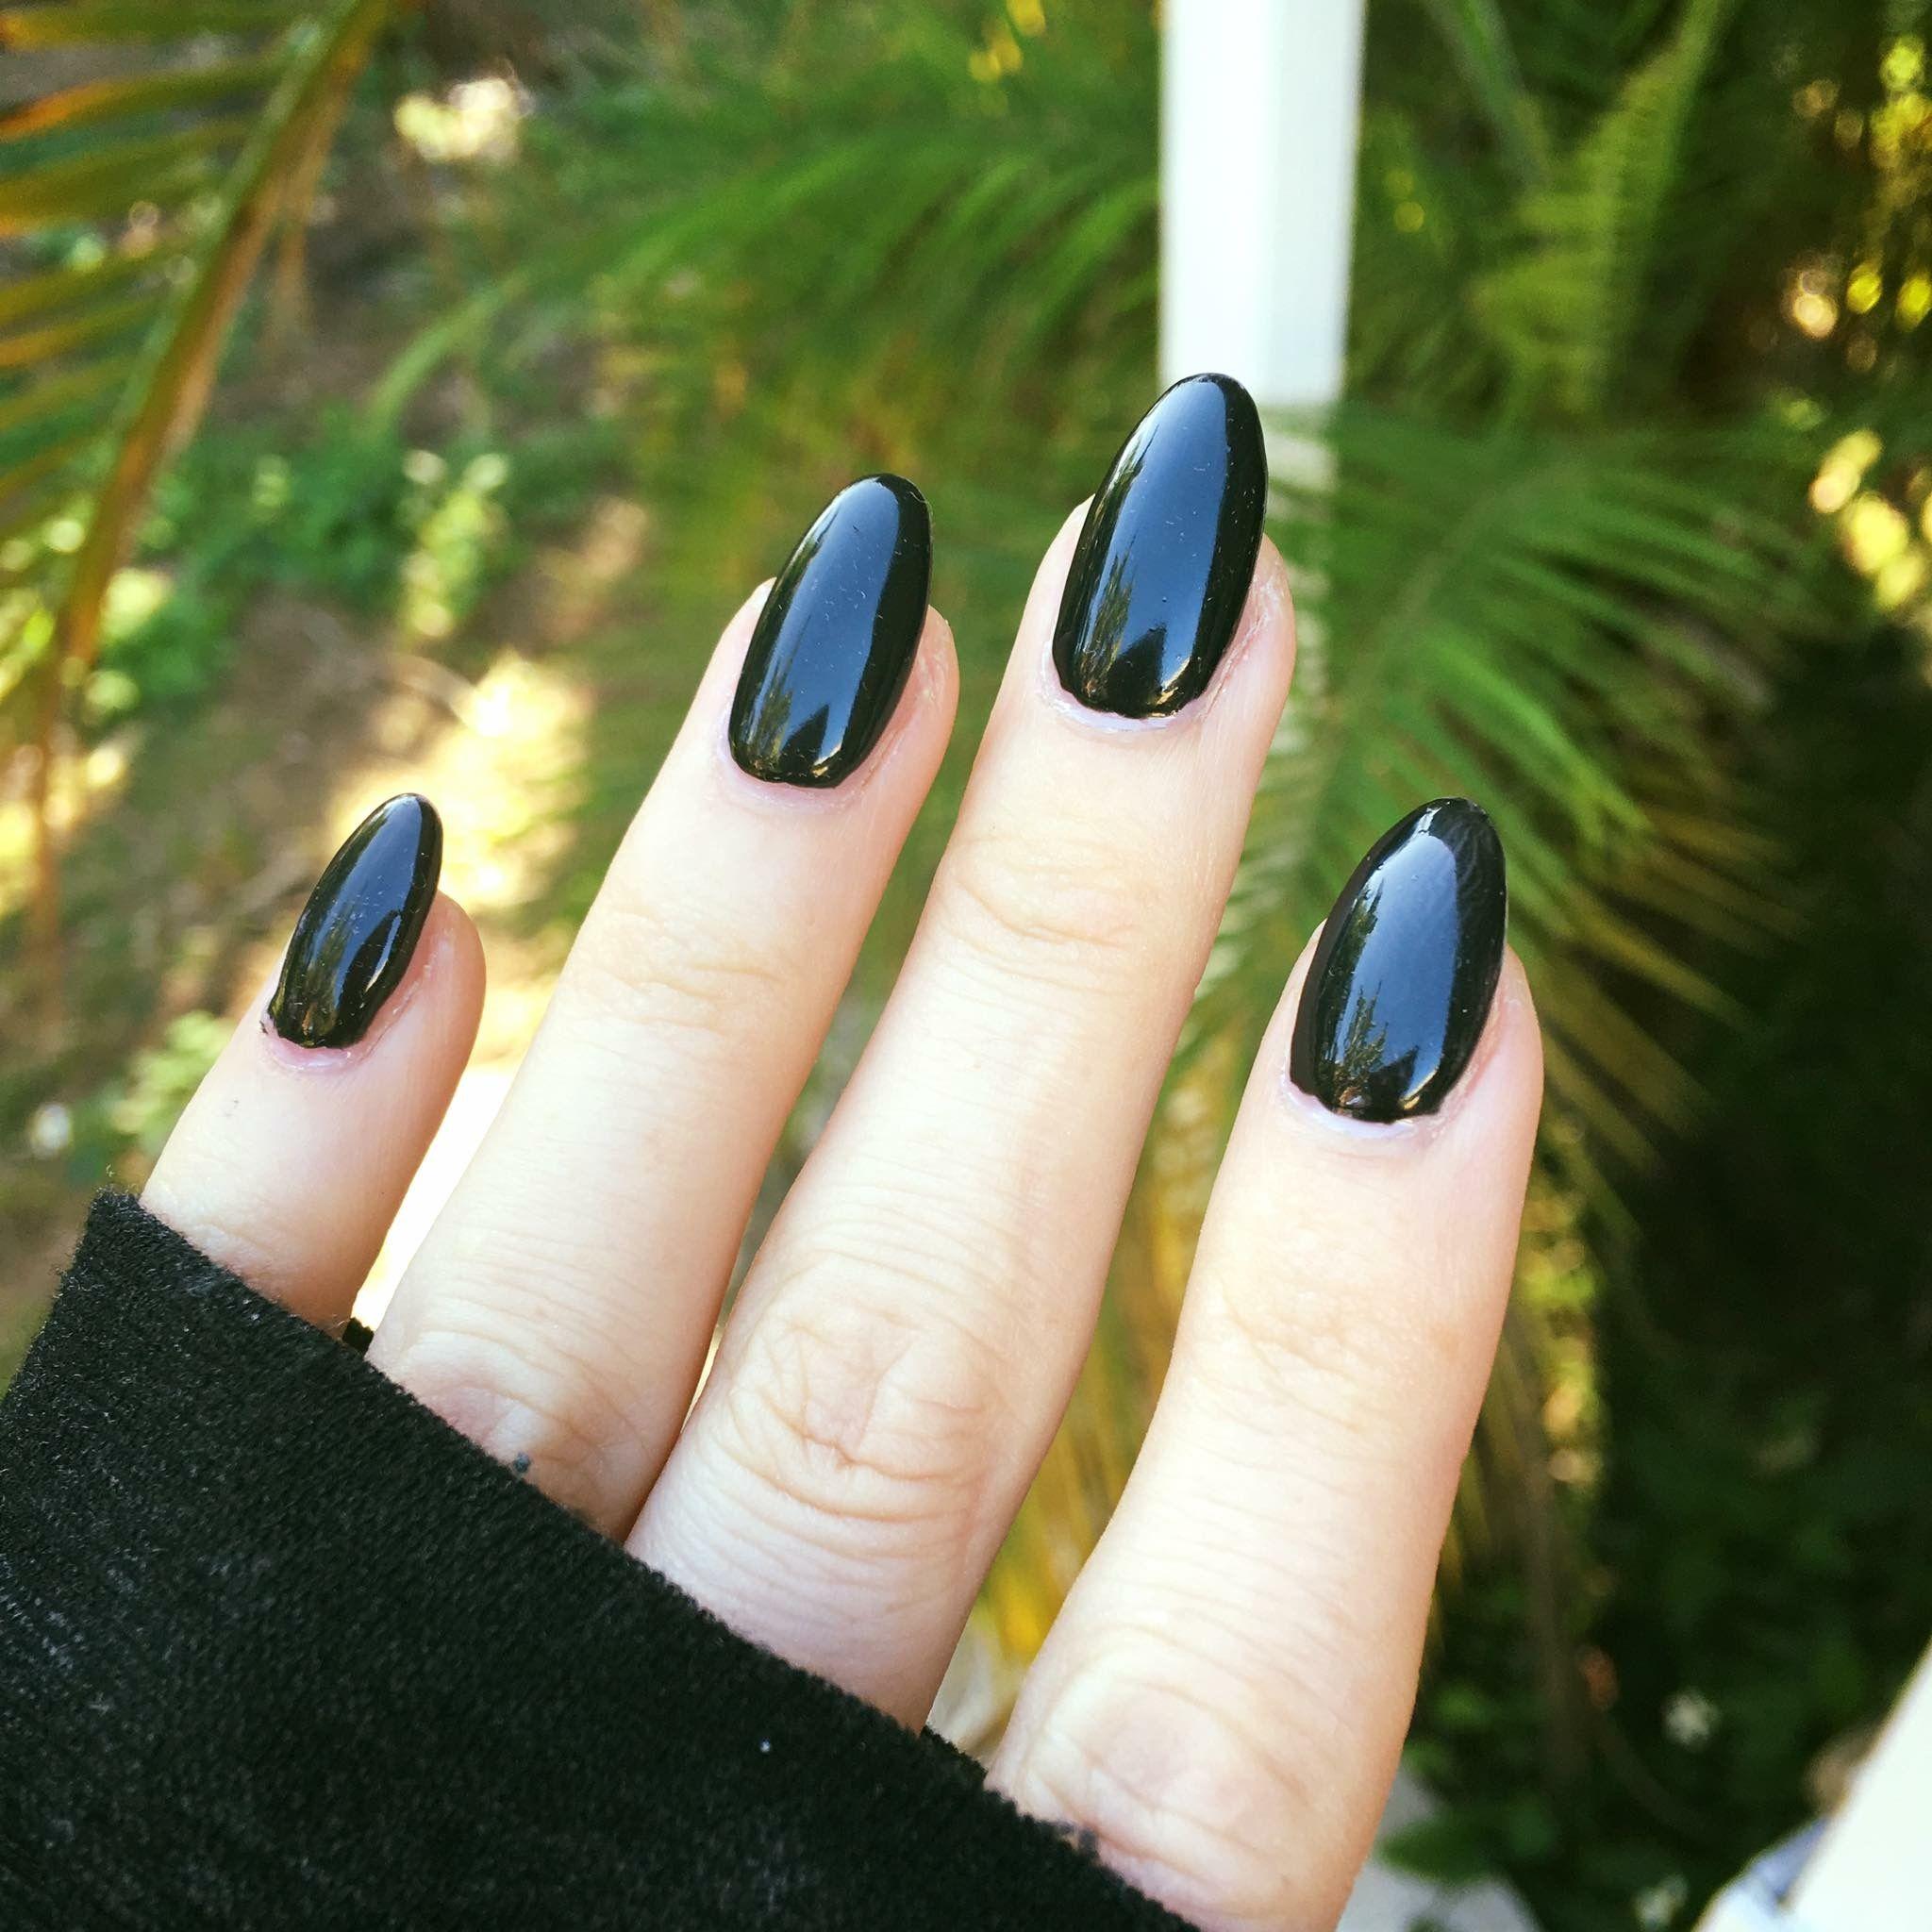 Black Almond Shaped Nails Almond Shape Nails Fall Almond Nails Black Almond Nails